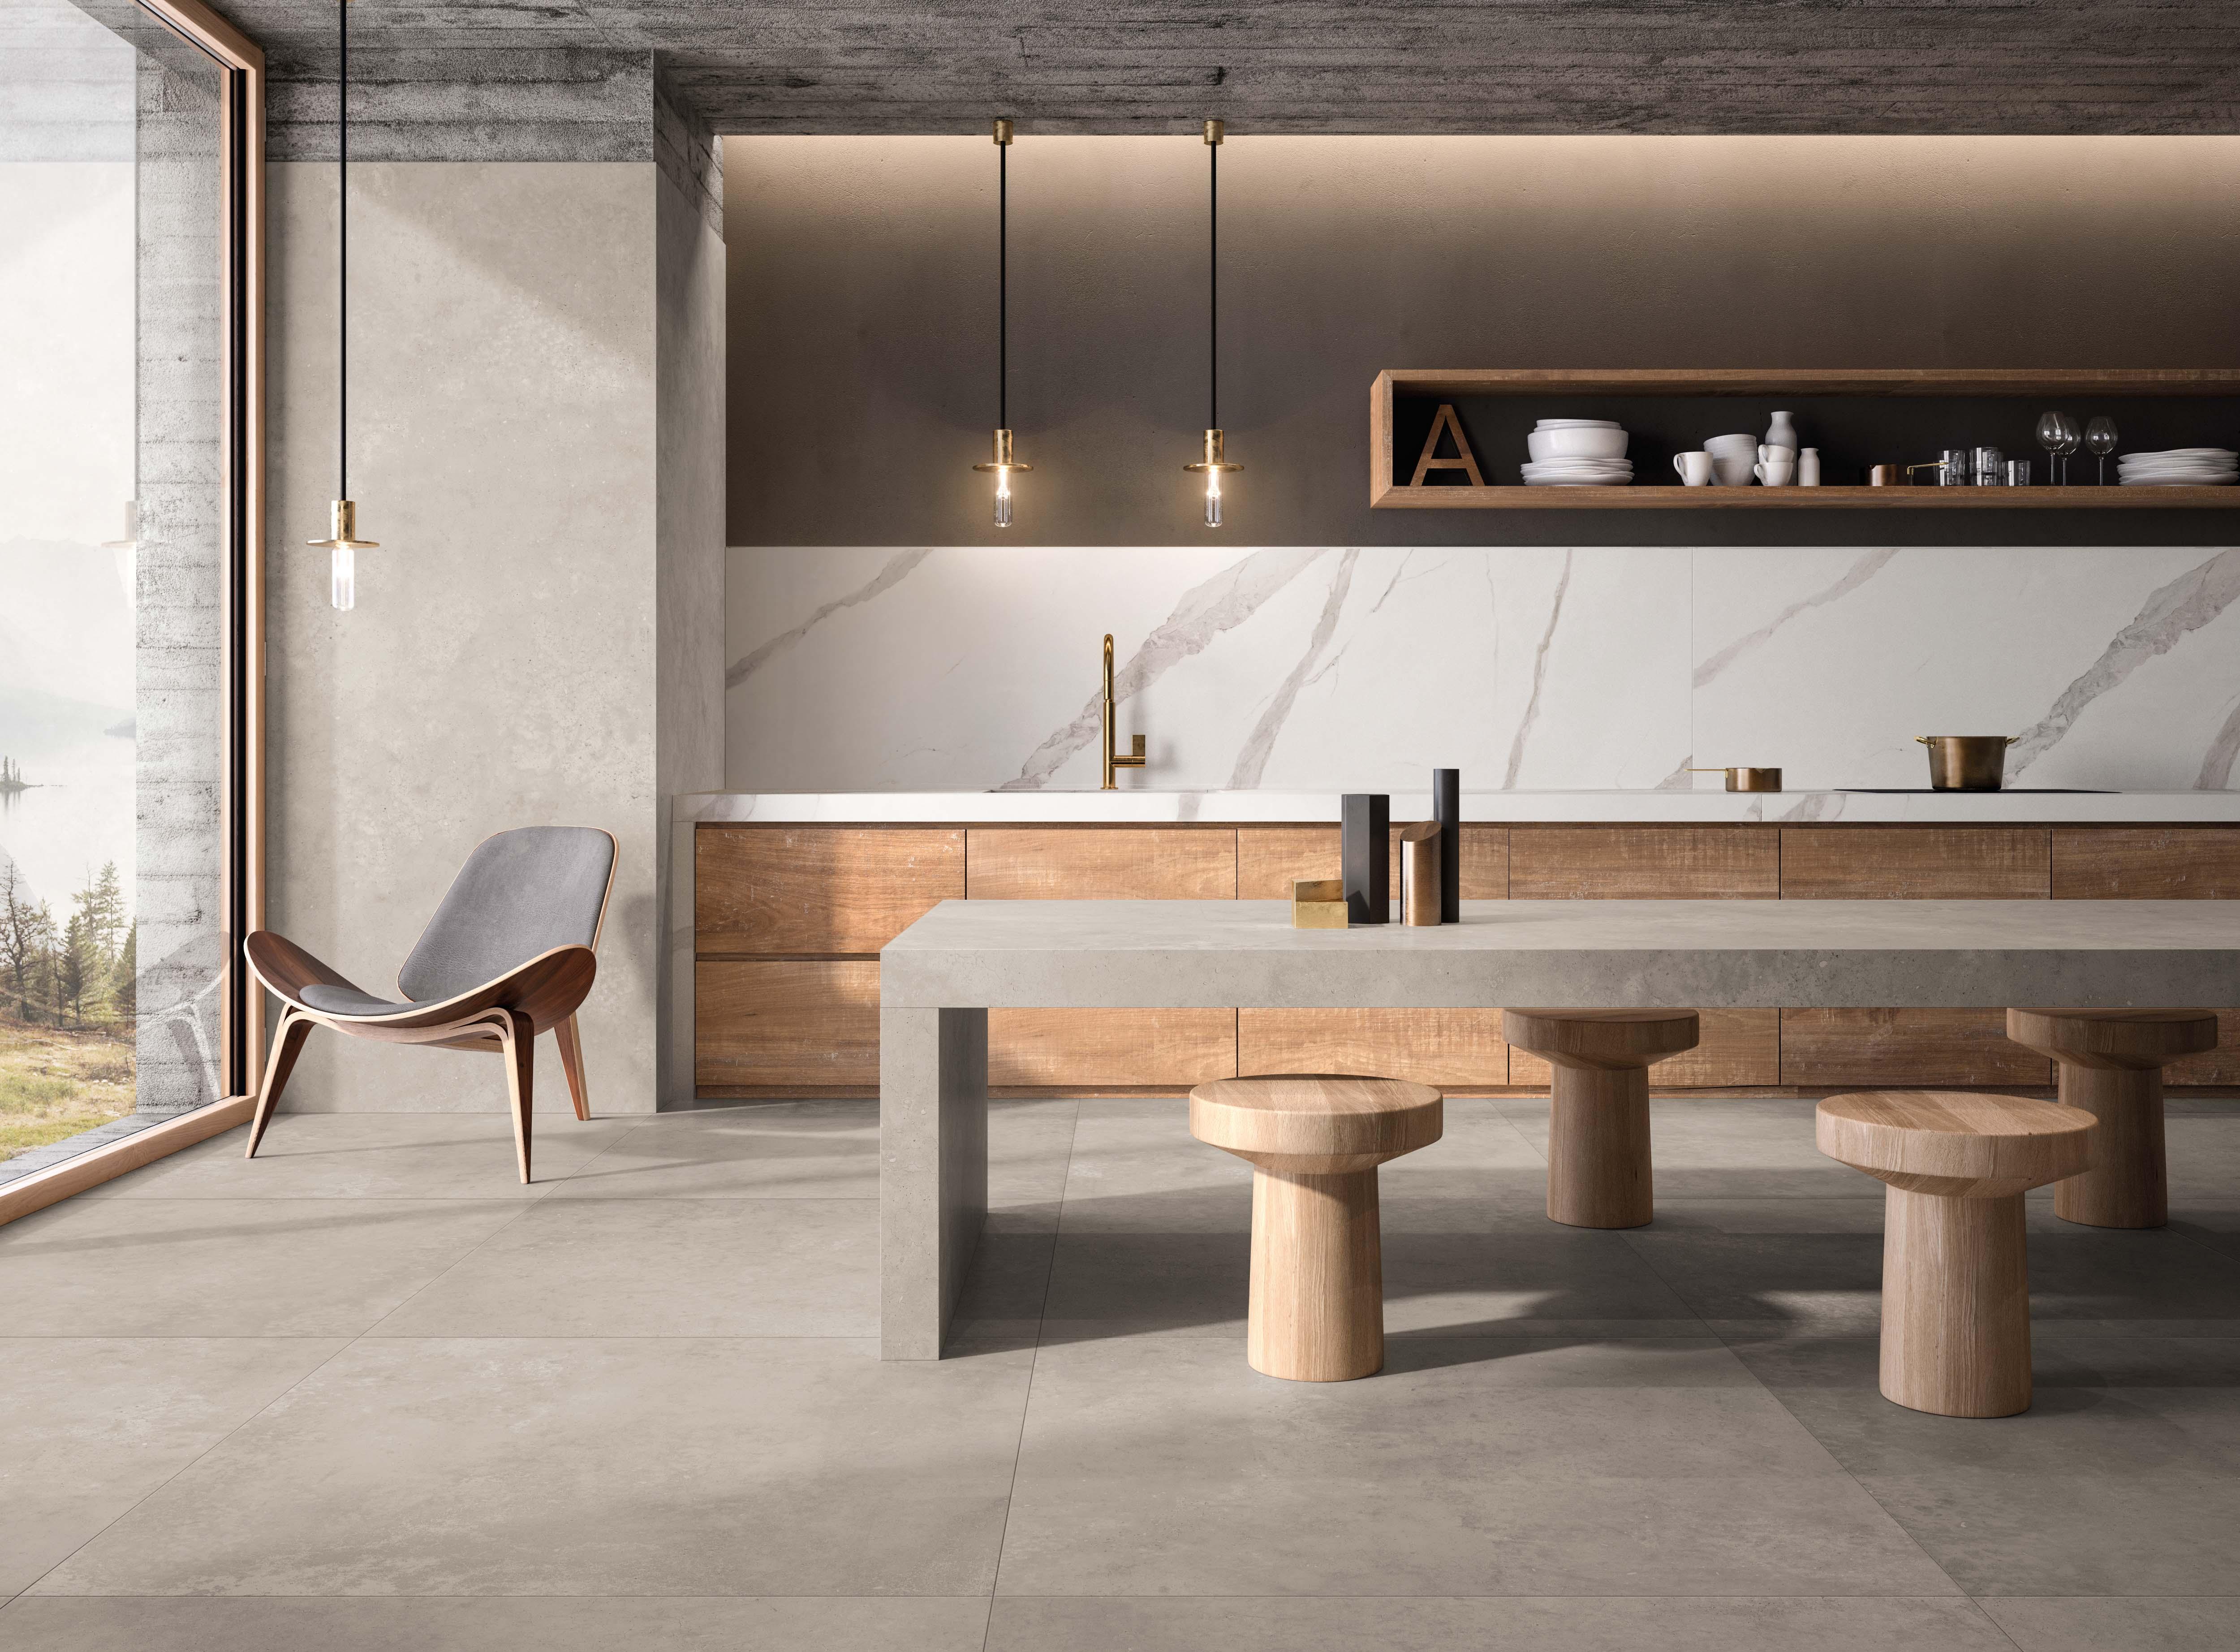 Concrete Tiles Ireland